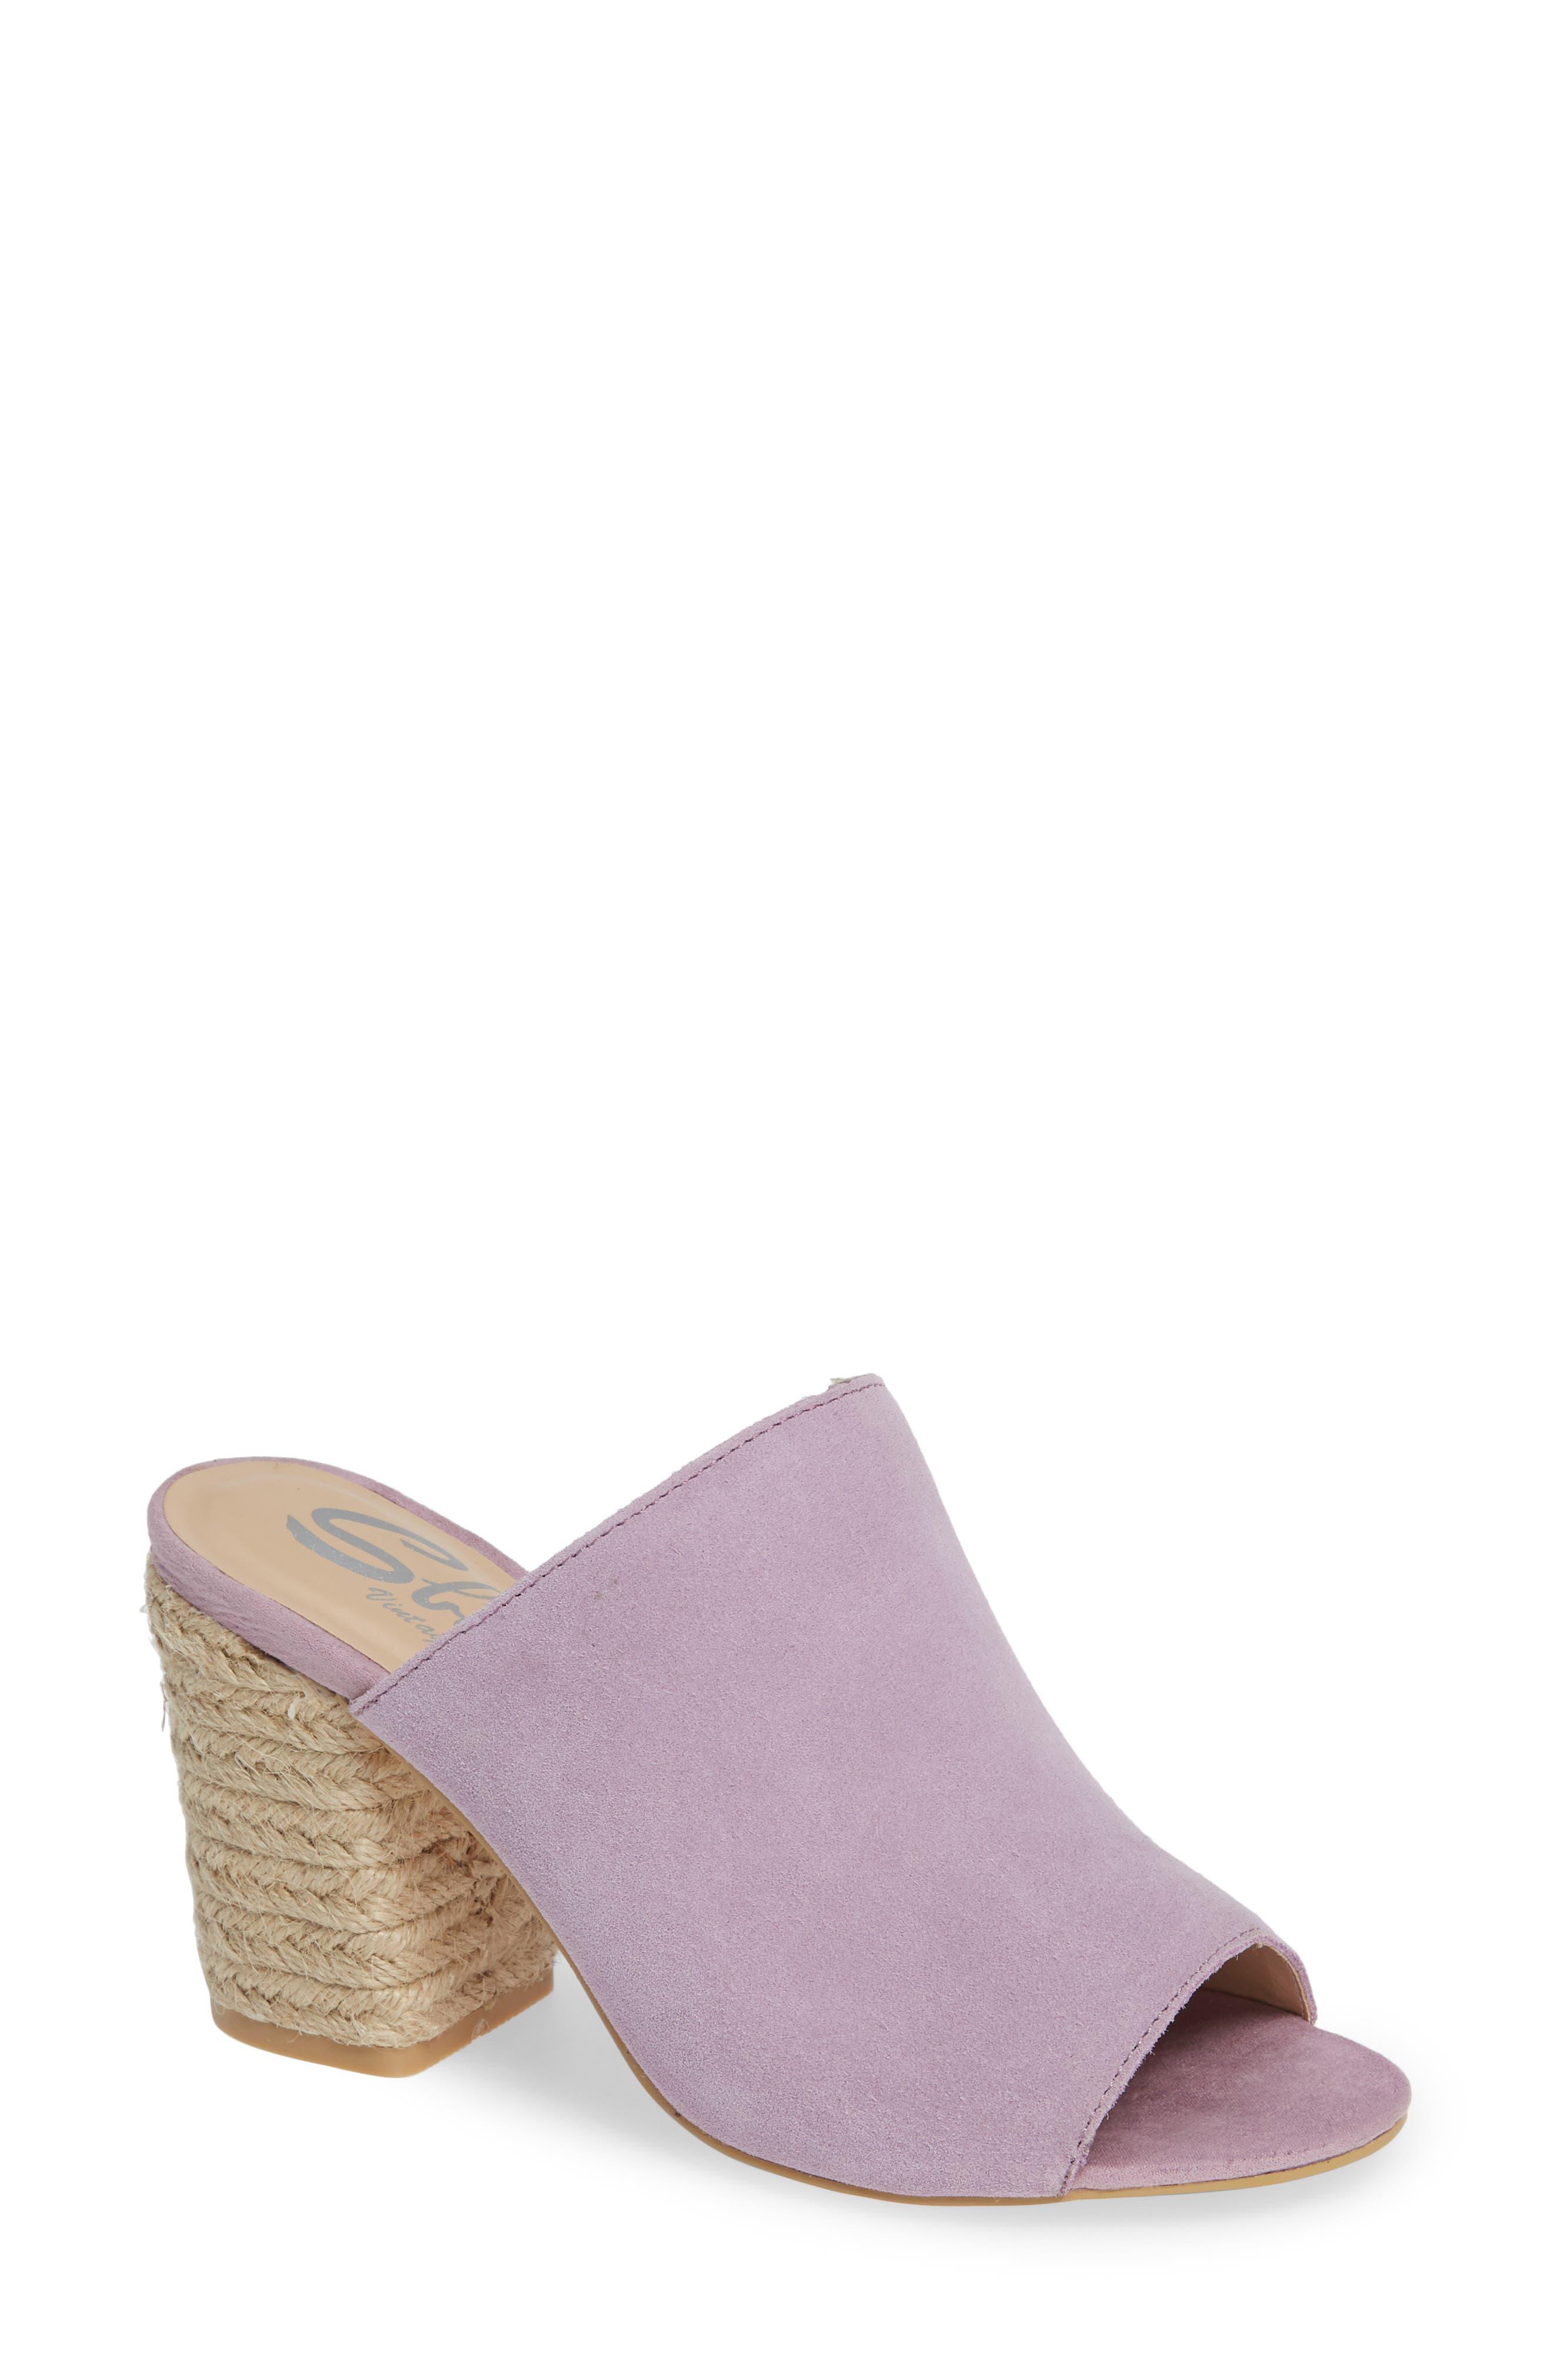 aadb8c9ed71251 Women s Sbicca Shoes